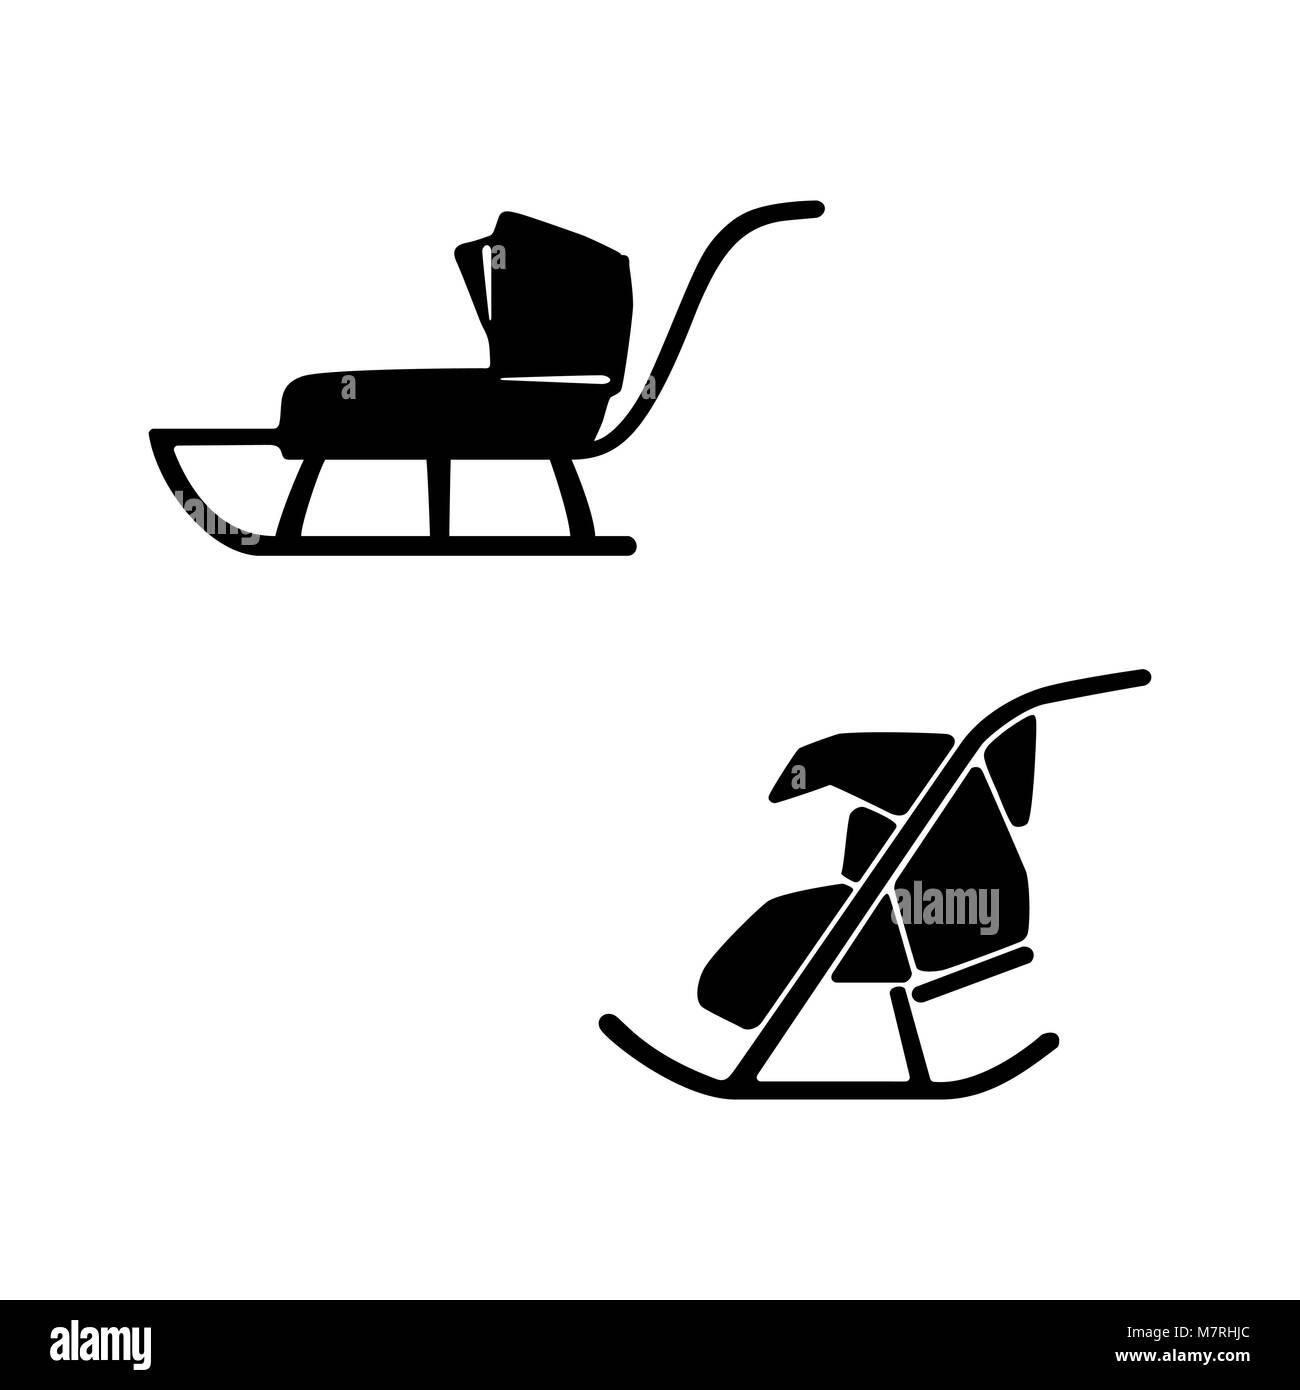 Winter. Sled. Hand drawn vector set of two sleds for baby, suckling. Sledge pram - Stock Image